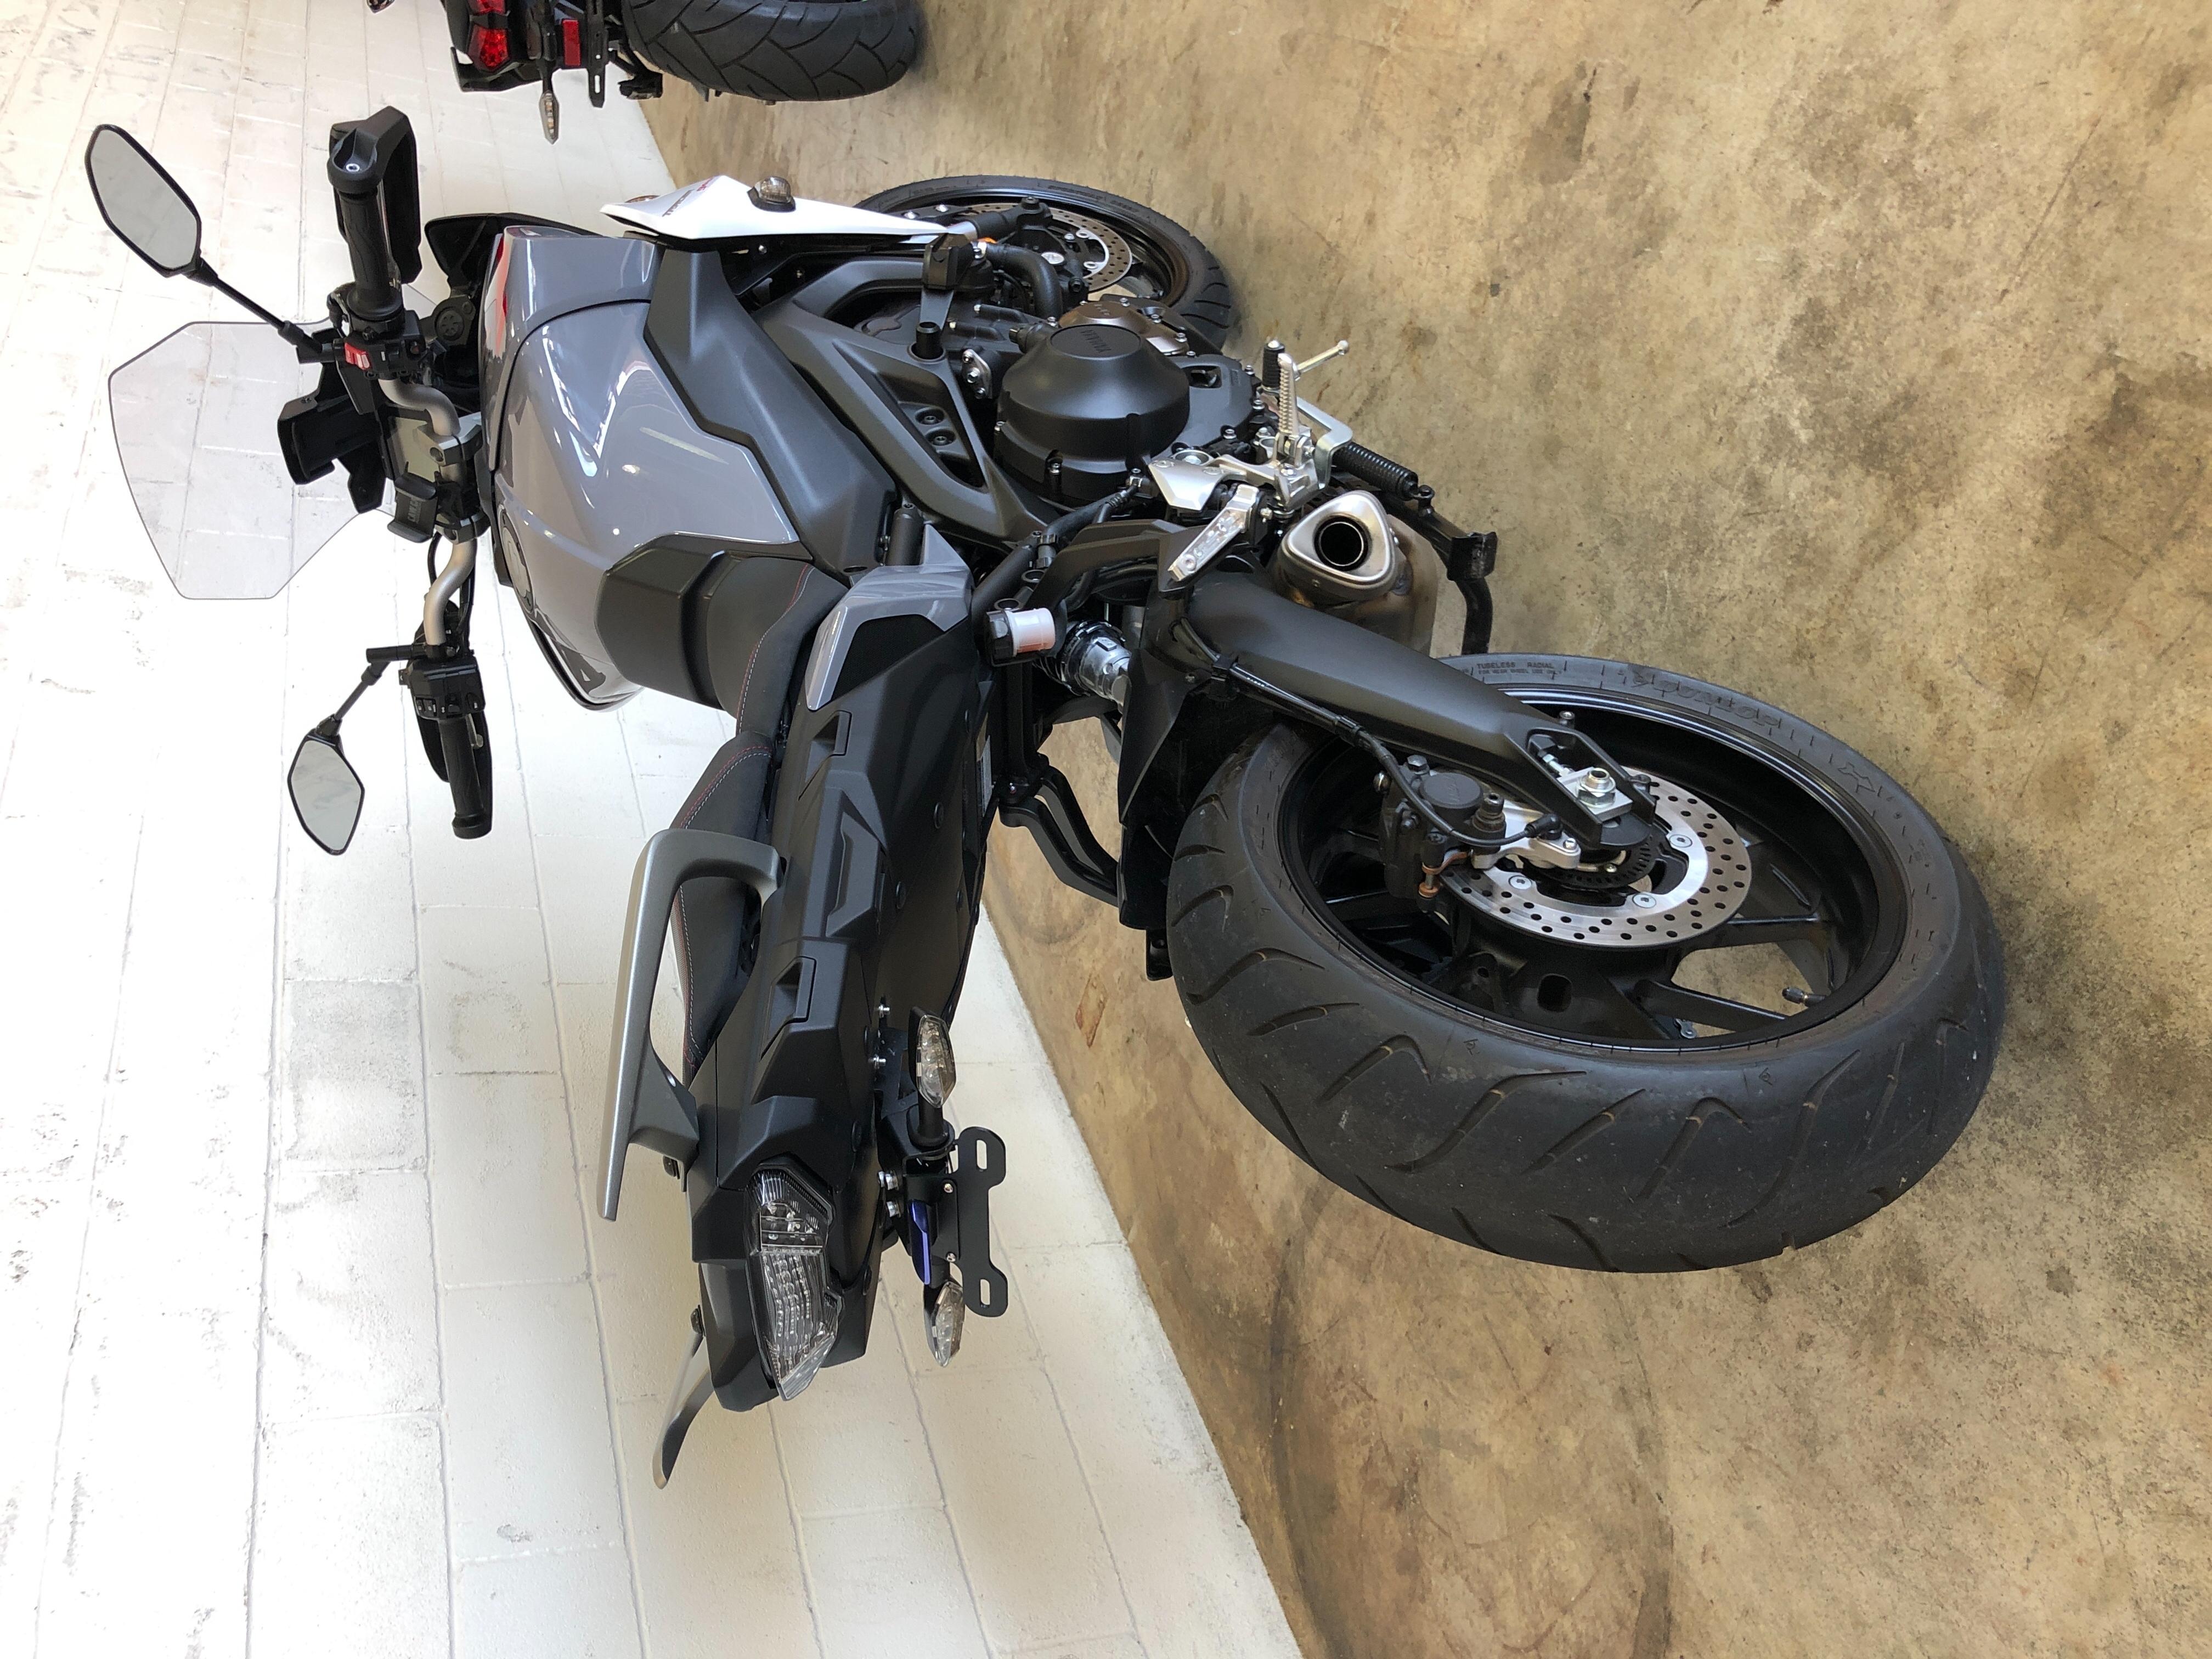 2019 Yamaha Tracer 900 at Twisted Cycles